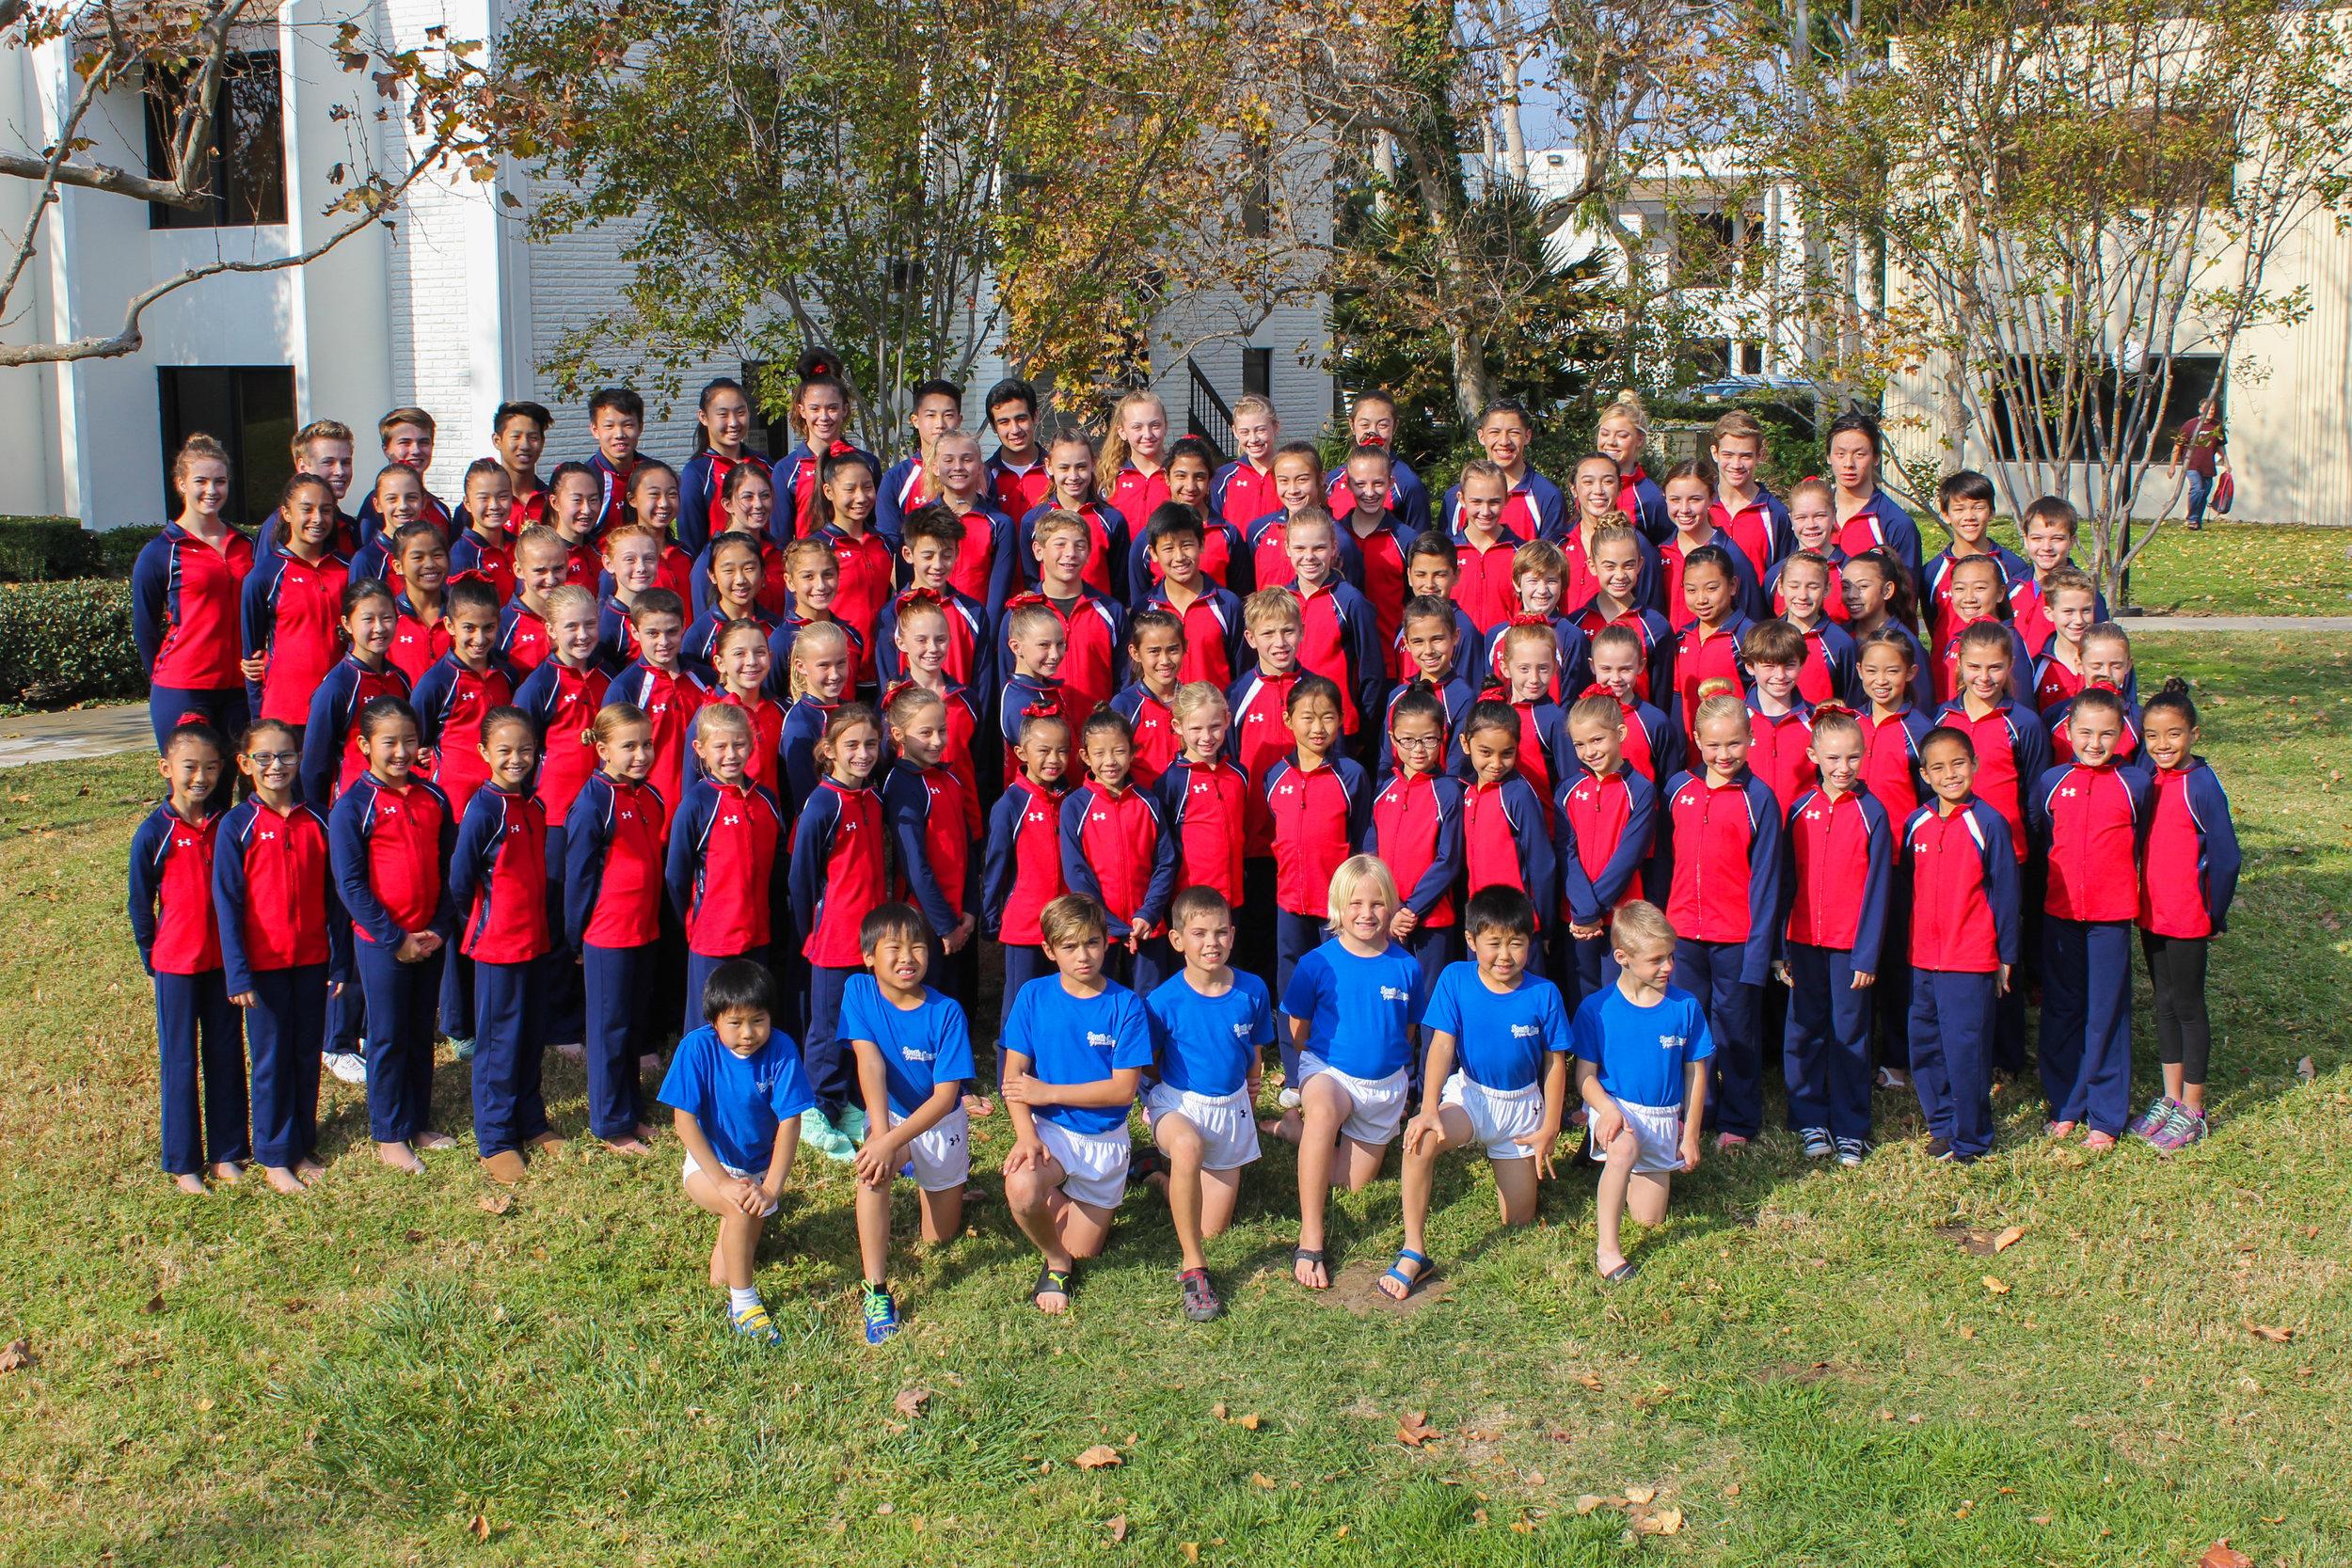 20171216_SCGTC_Team-017.jpg